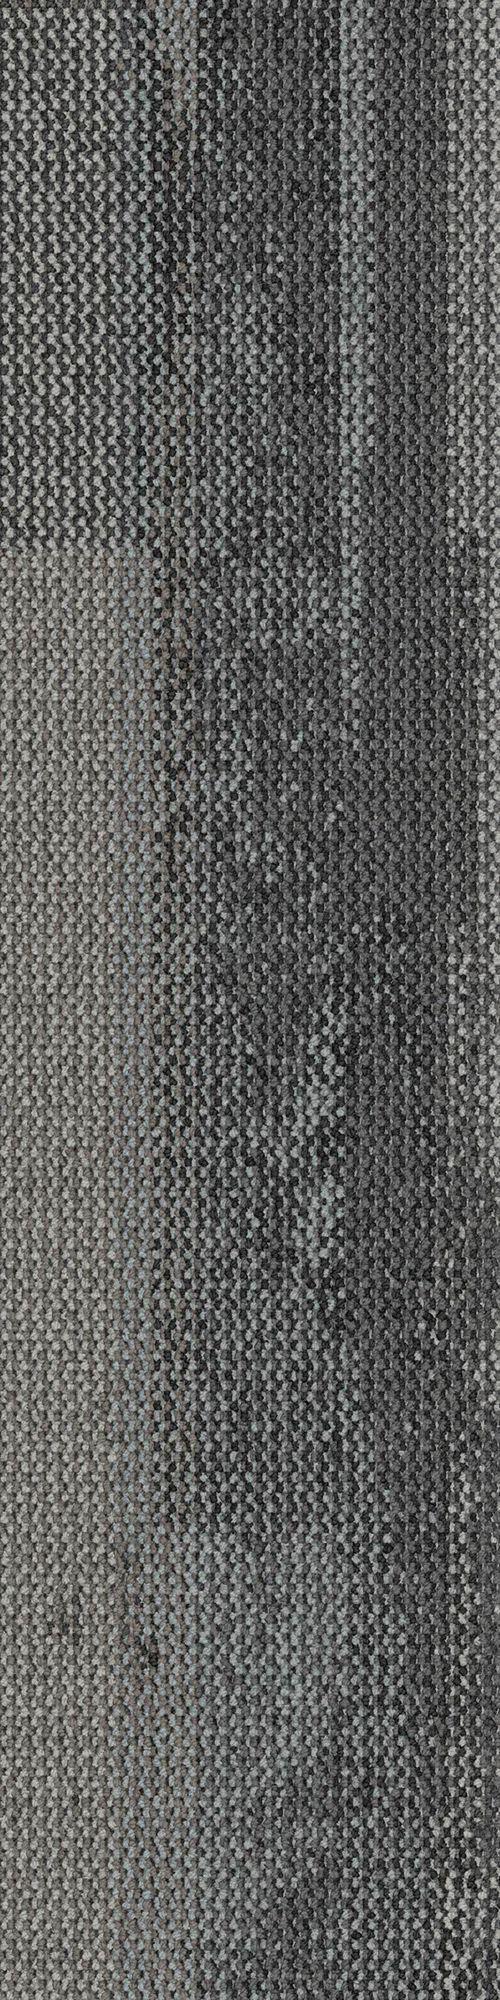 Interface carpet tile: Reclaim Color name: Antique Grey